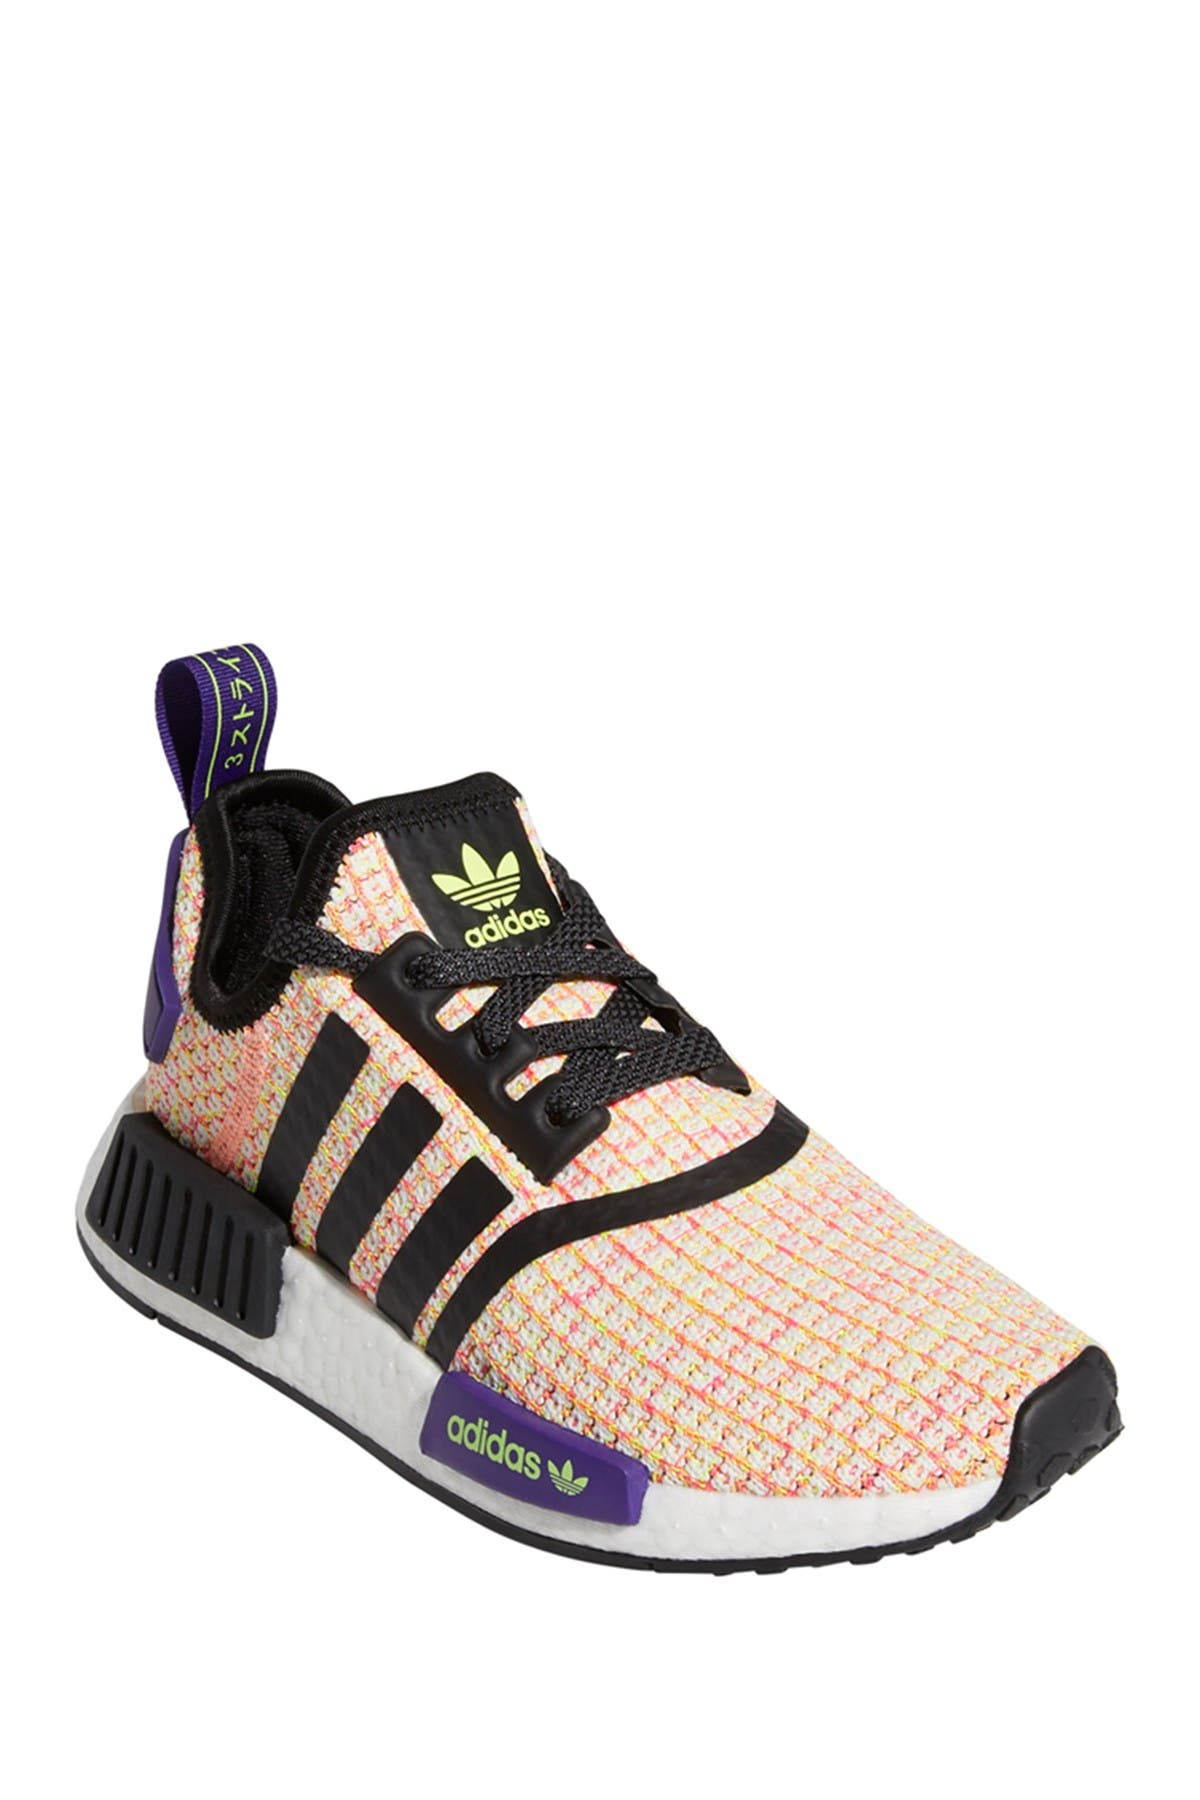 Image of adidas NMD R1 Sneaker